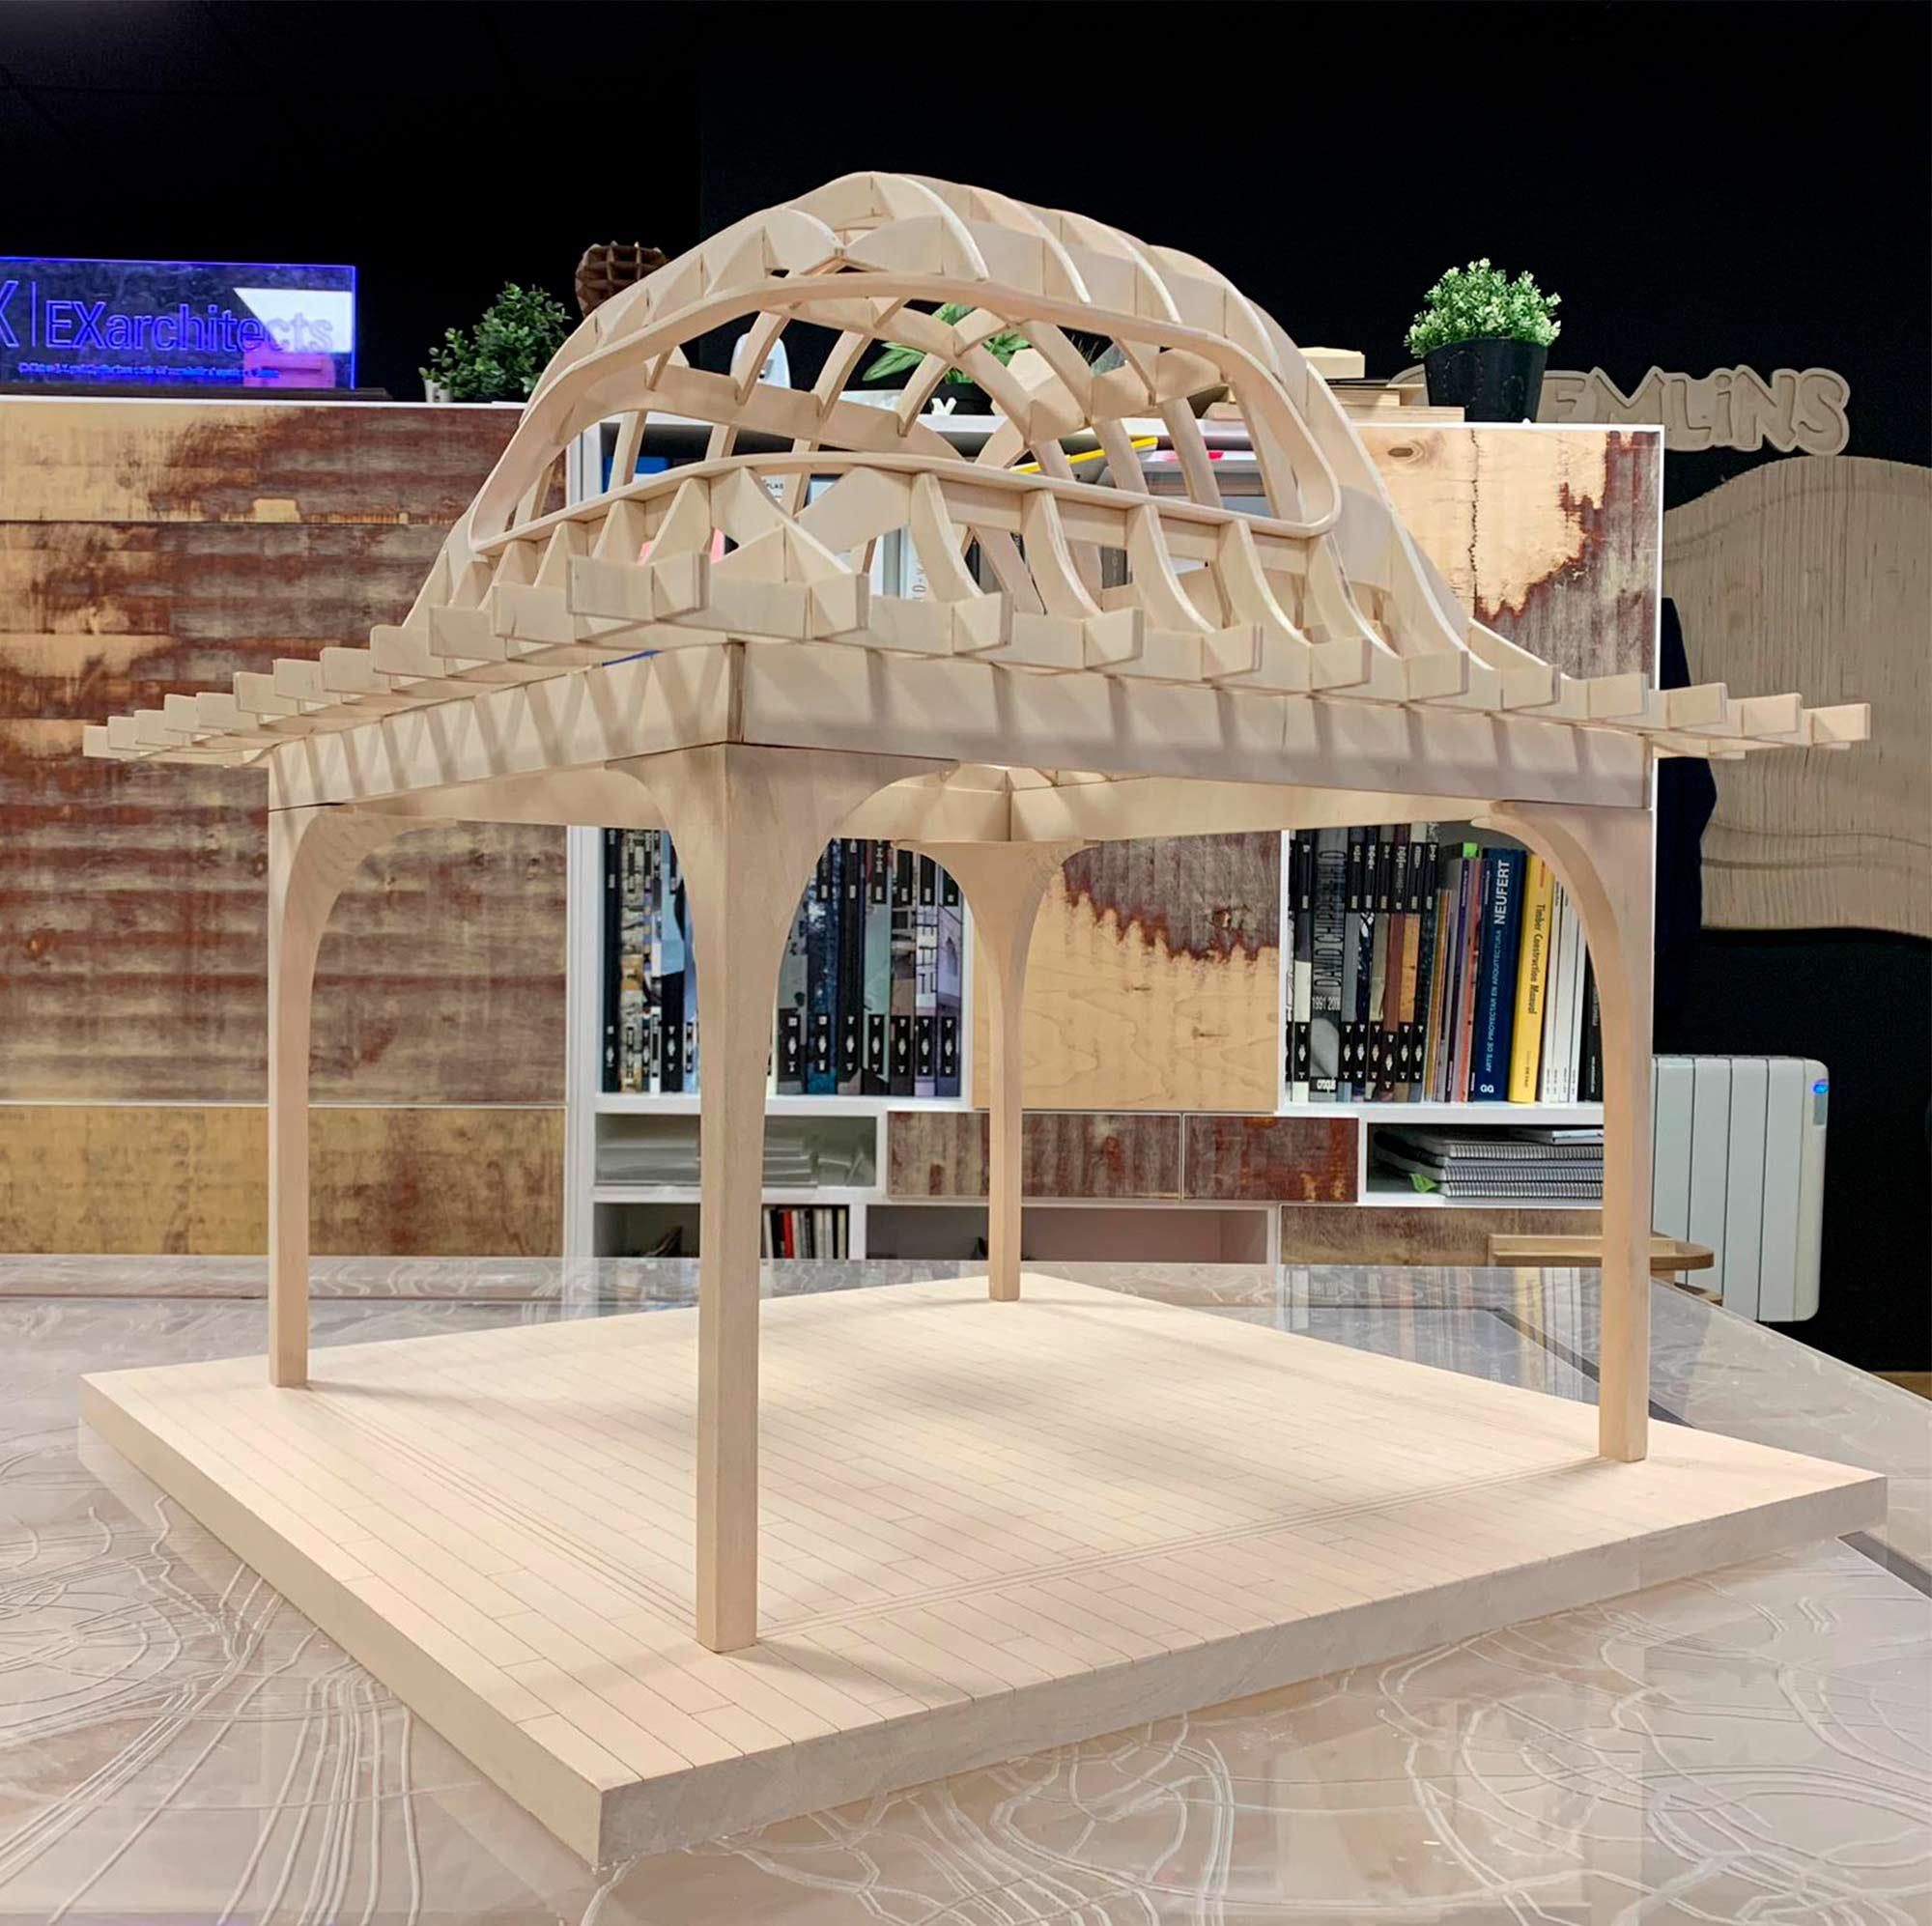 Maqueta constructiva fabricada por EXarchitects para Foster & Partners